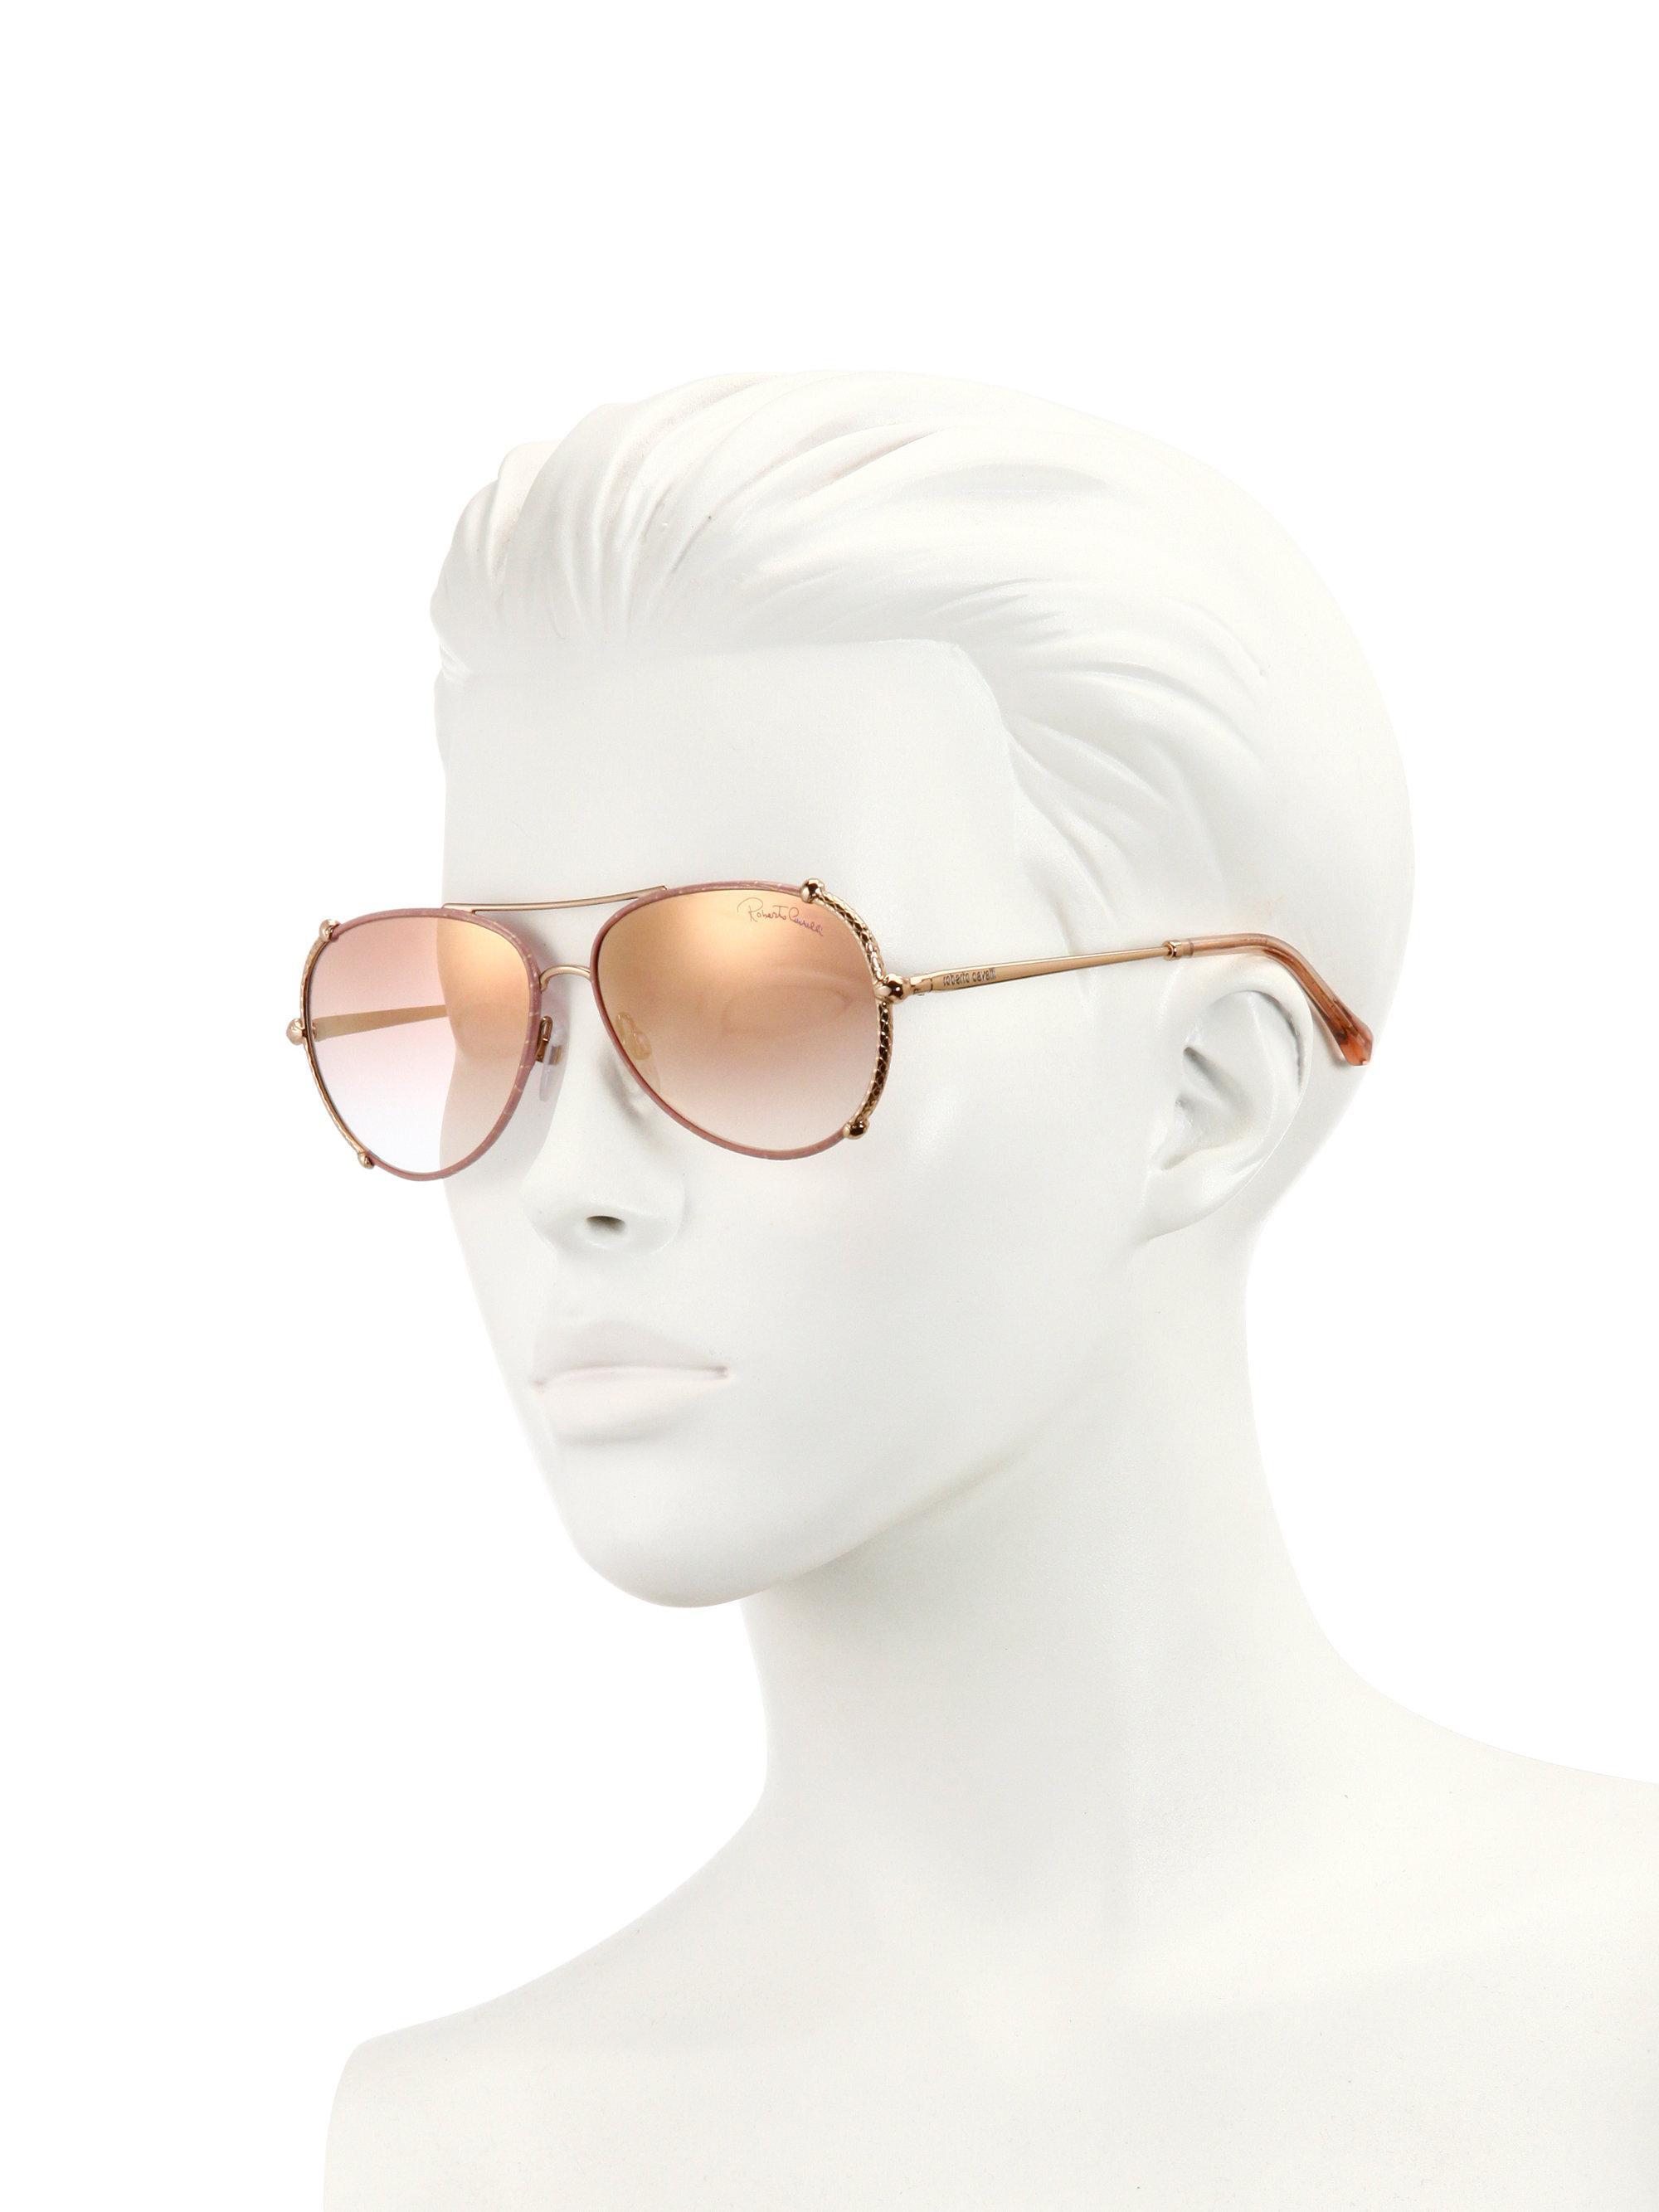 a1e3a5f6c Roberto Cavalli Women's 58mm Leather-trim Aviator Sunglasses - Pink ...